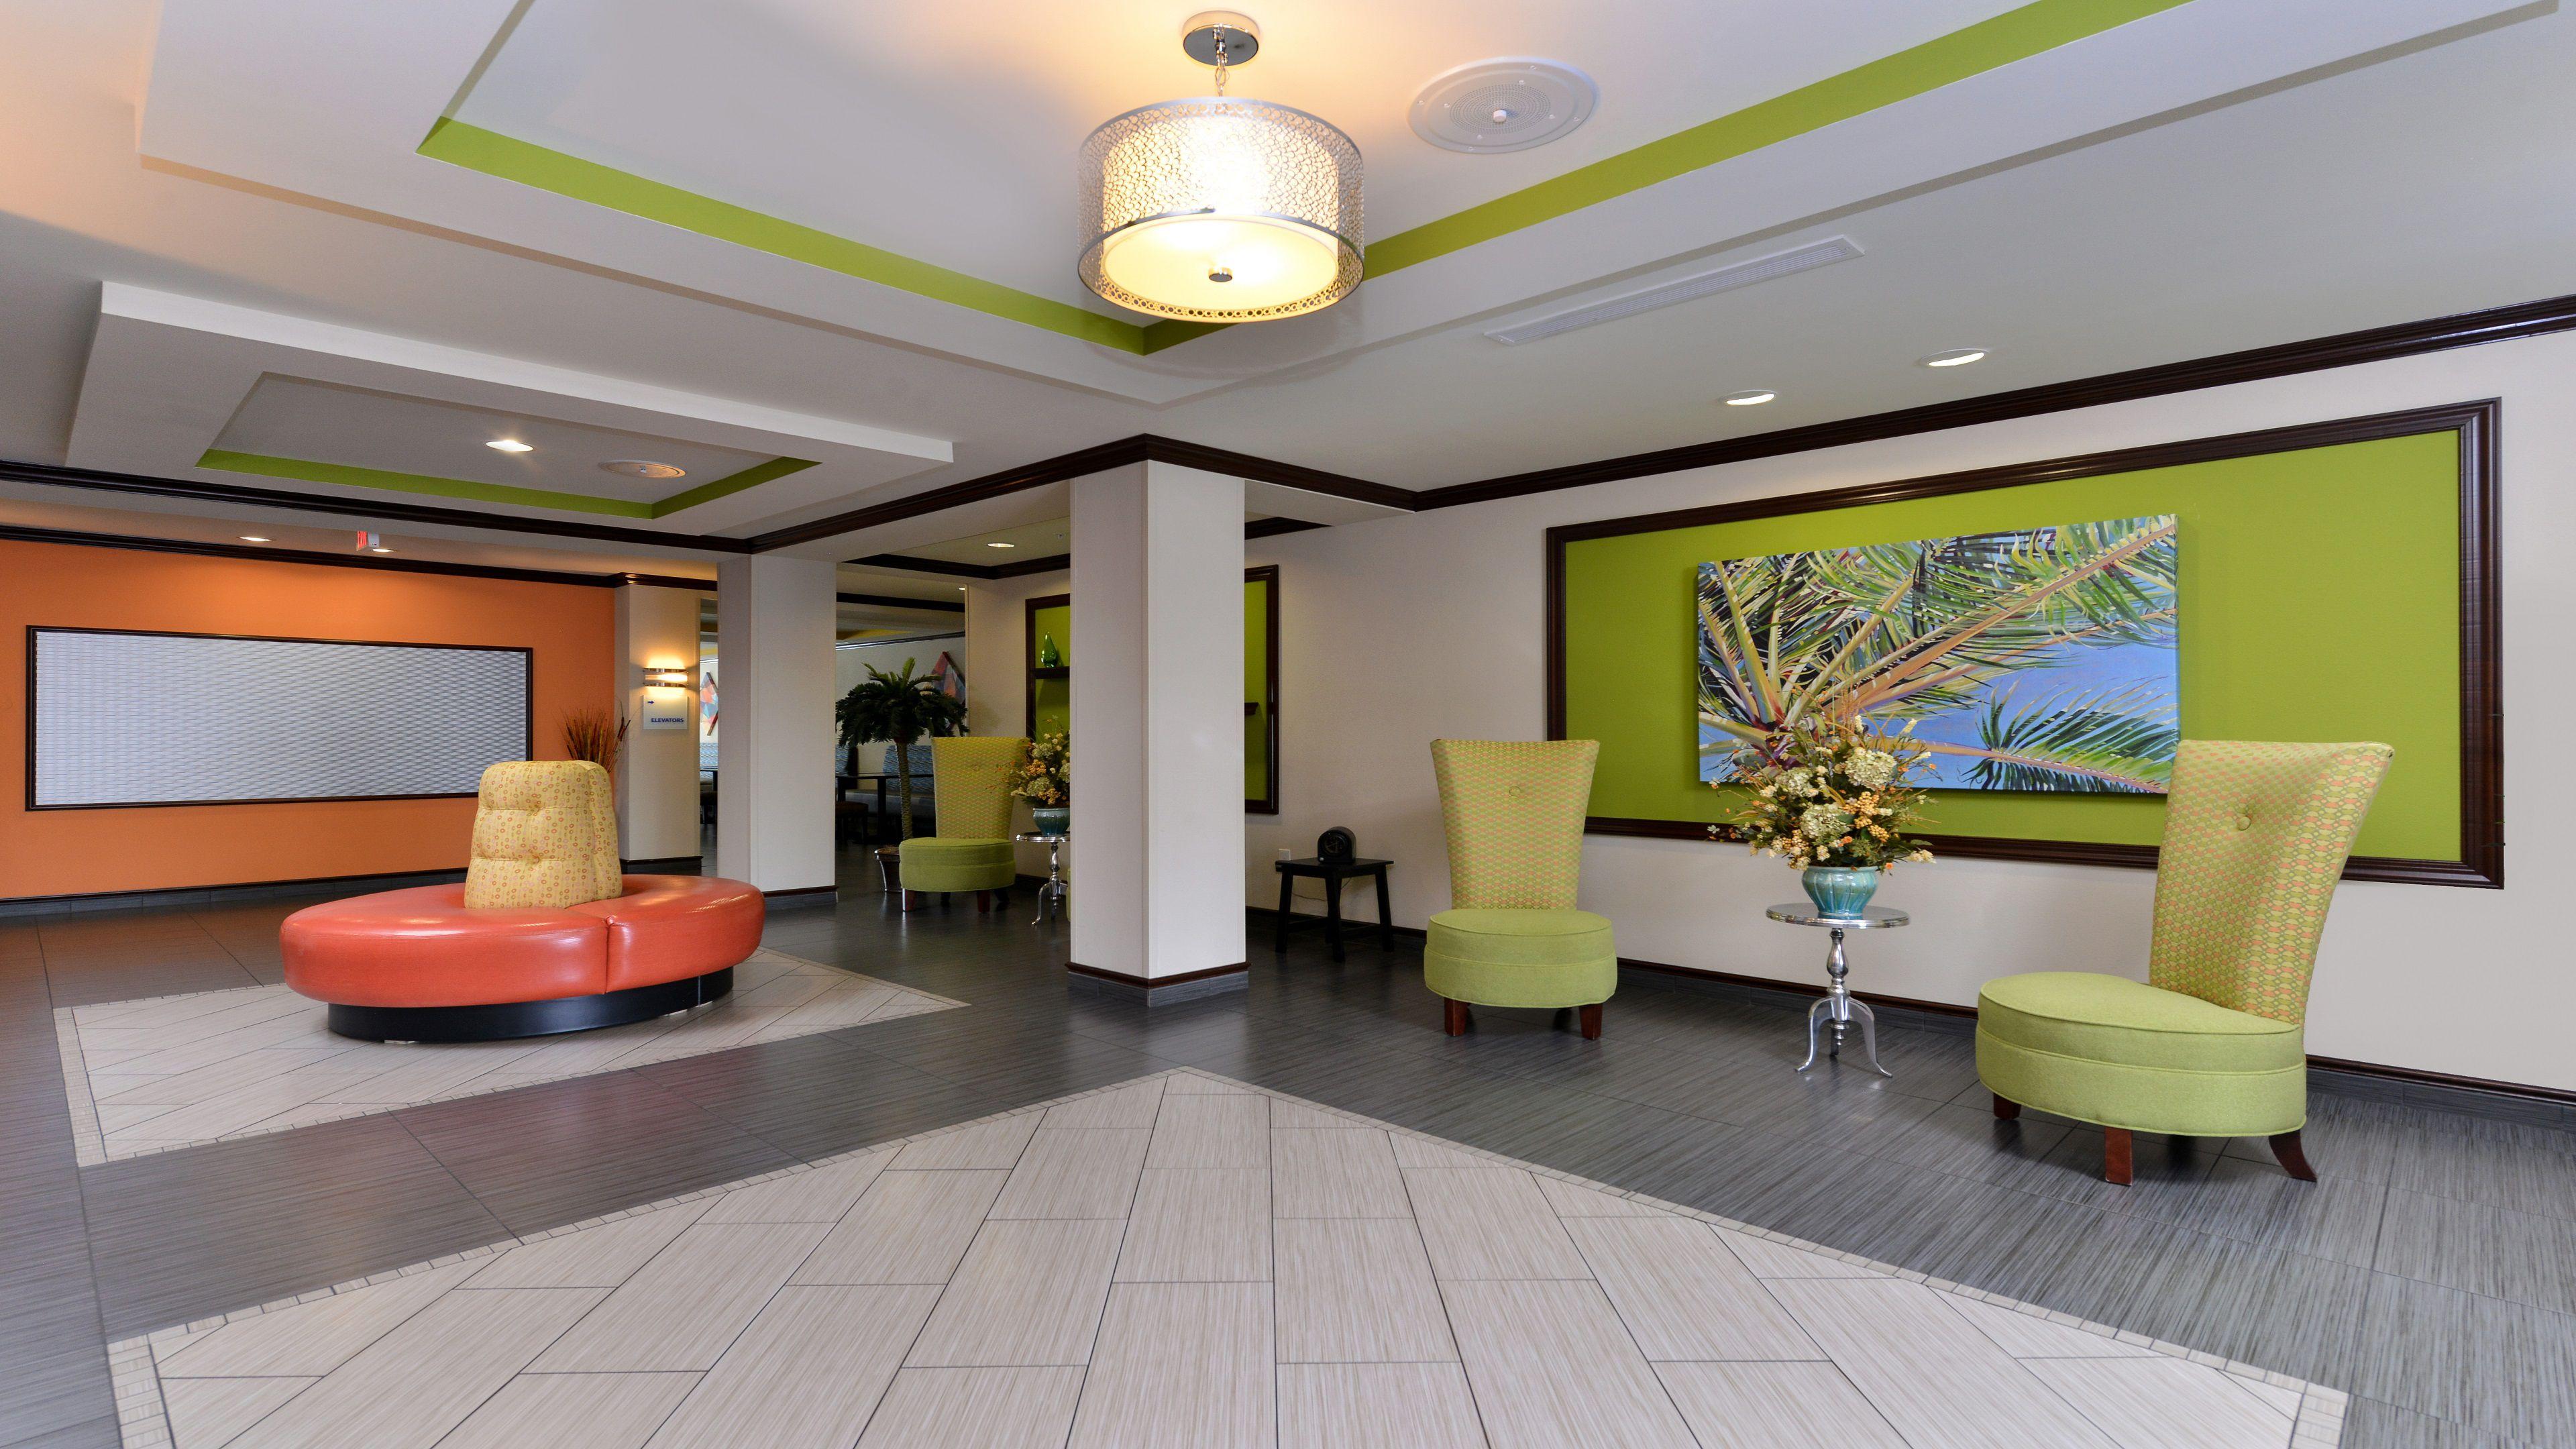 Holiday Inn Express & Suites Ft. Walton Bch - Hurlburt Area image 4